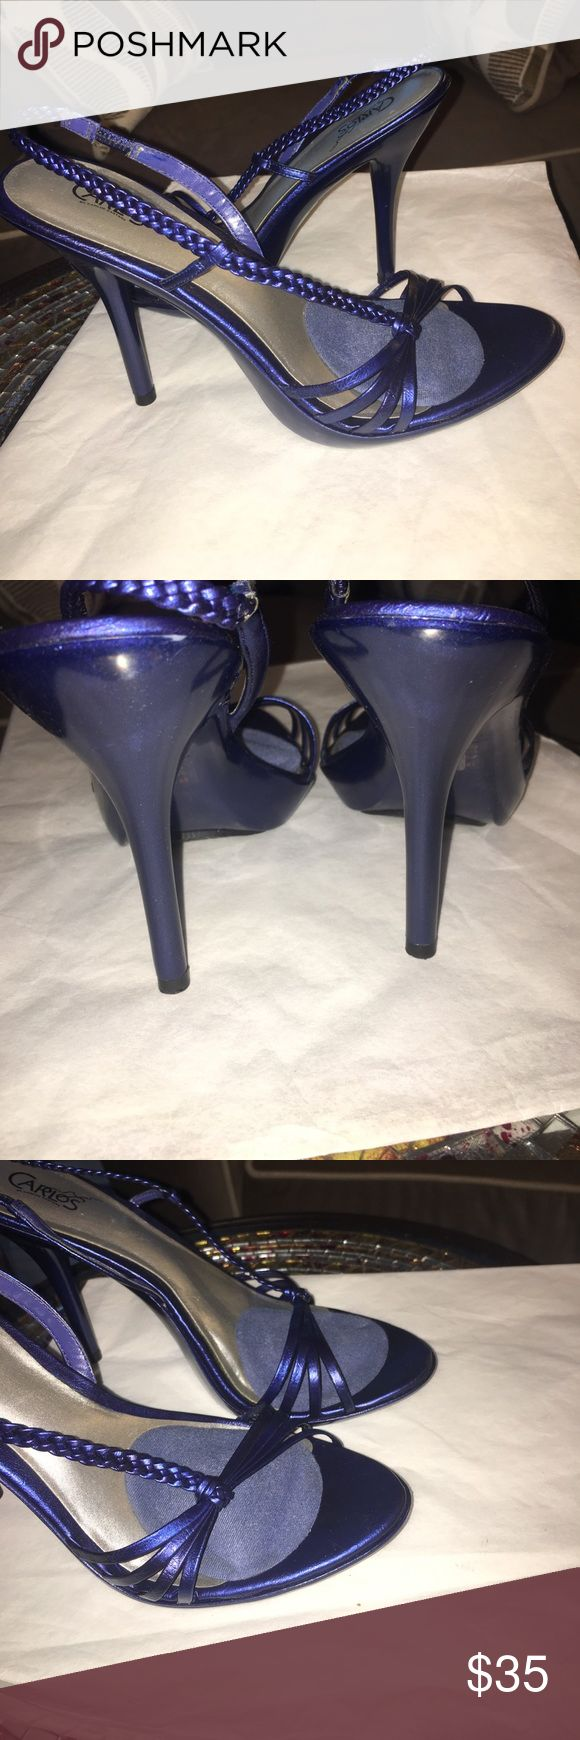 Beautiful blue strappy heels Make any outfit look AMAZING in these beautiful blue 4 inch strappy heels Carlos Santana Shoes Heels